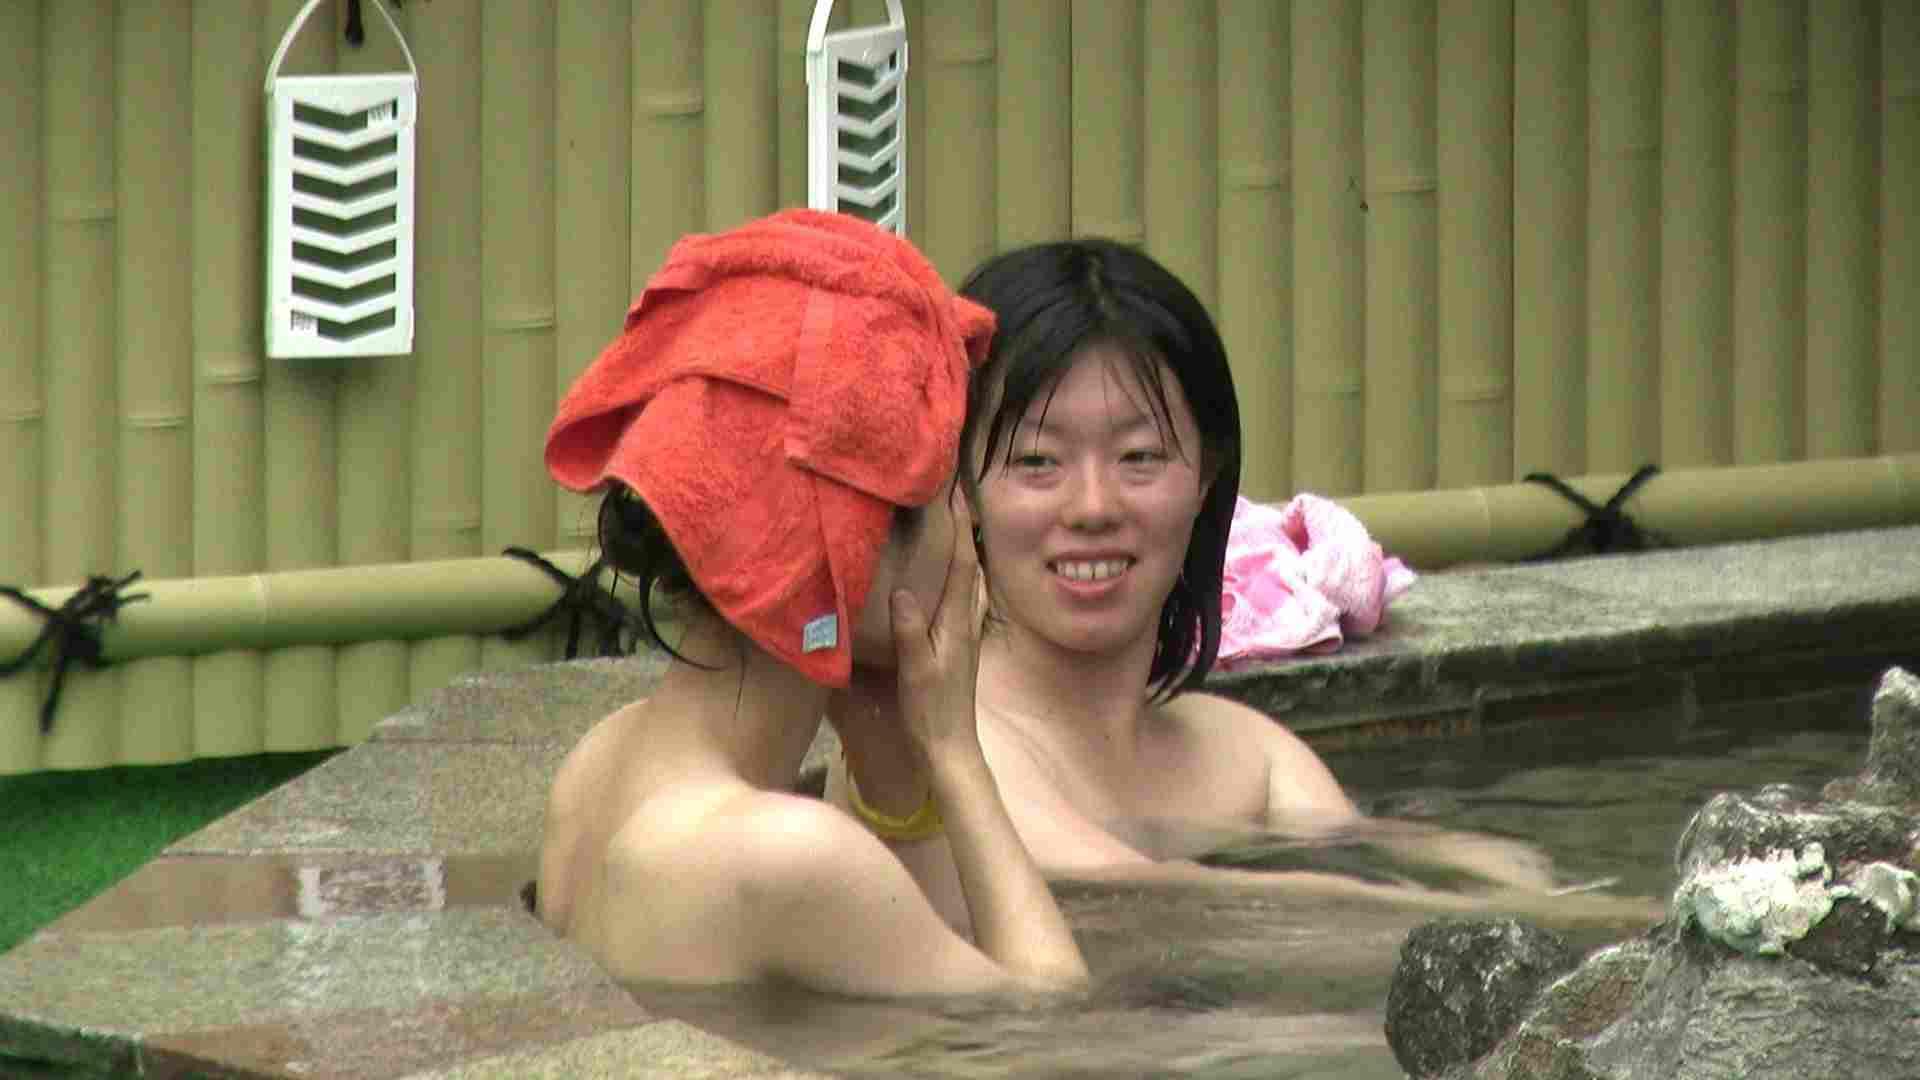 Aquaな露天風呂Vol.187 盗撮映像  99Pix 19